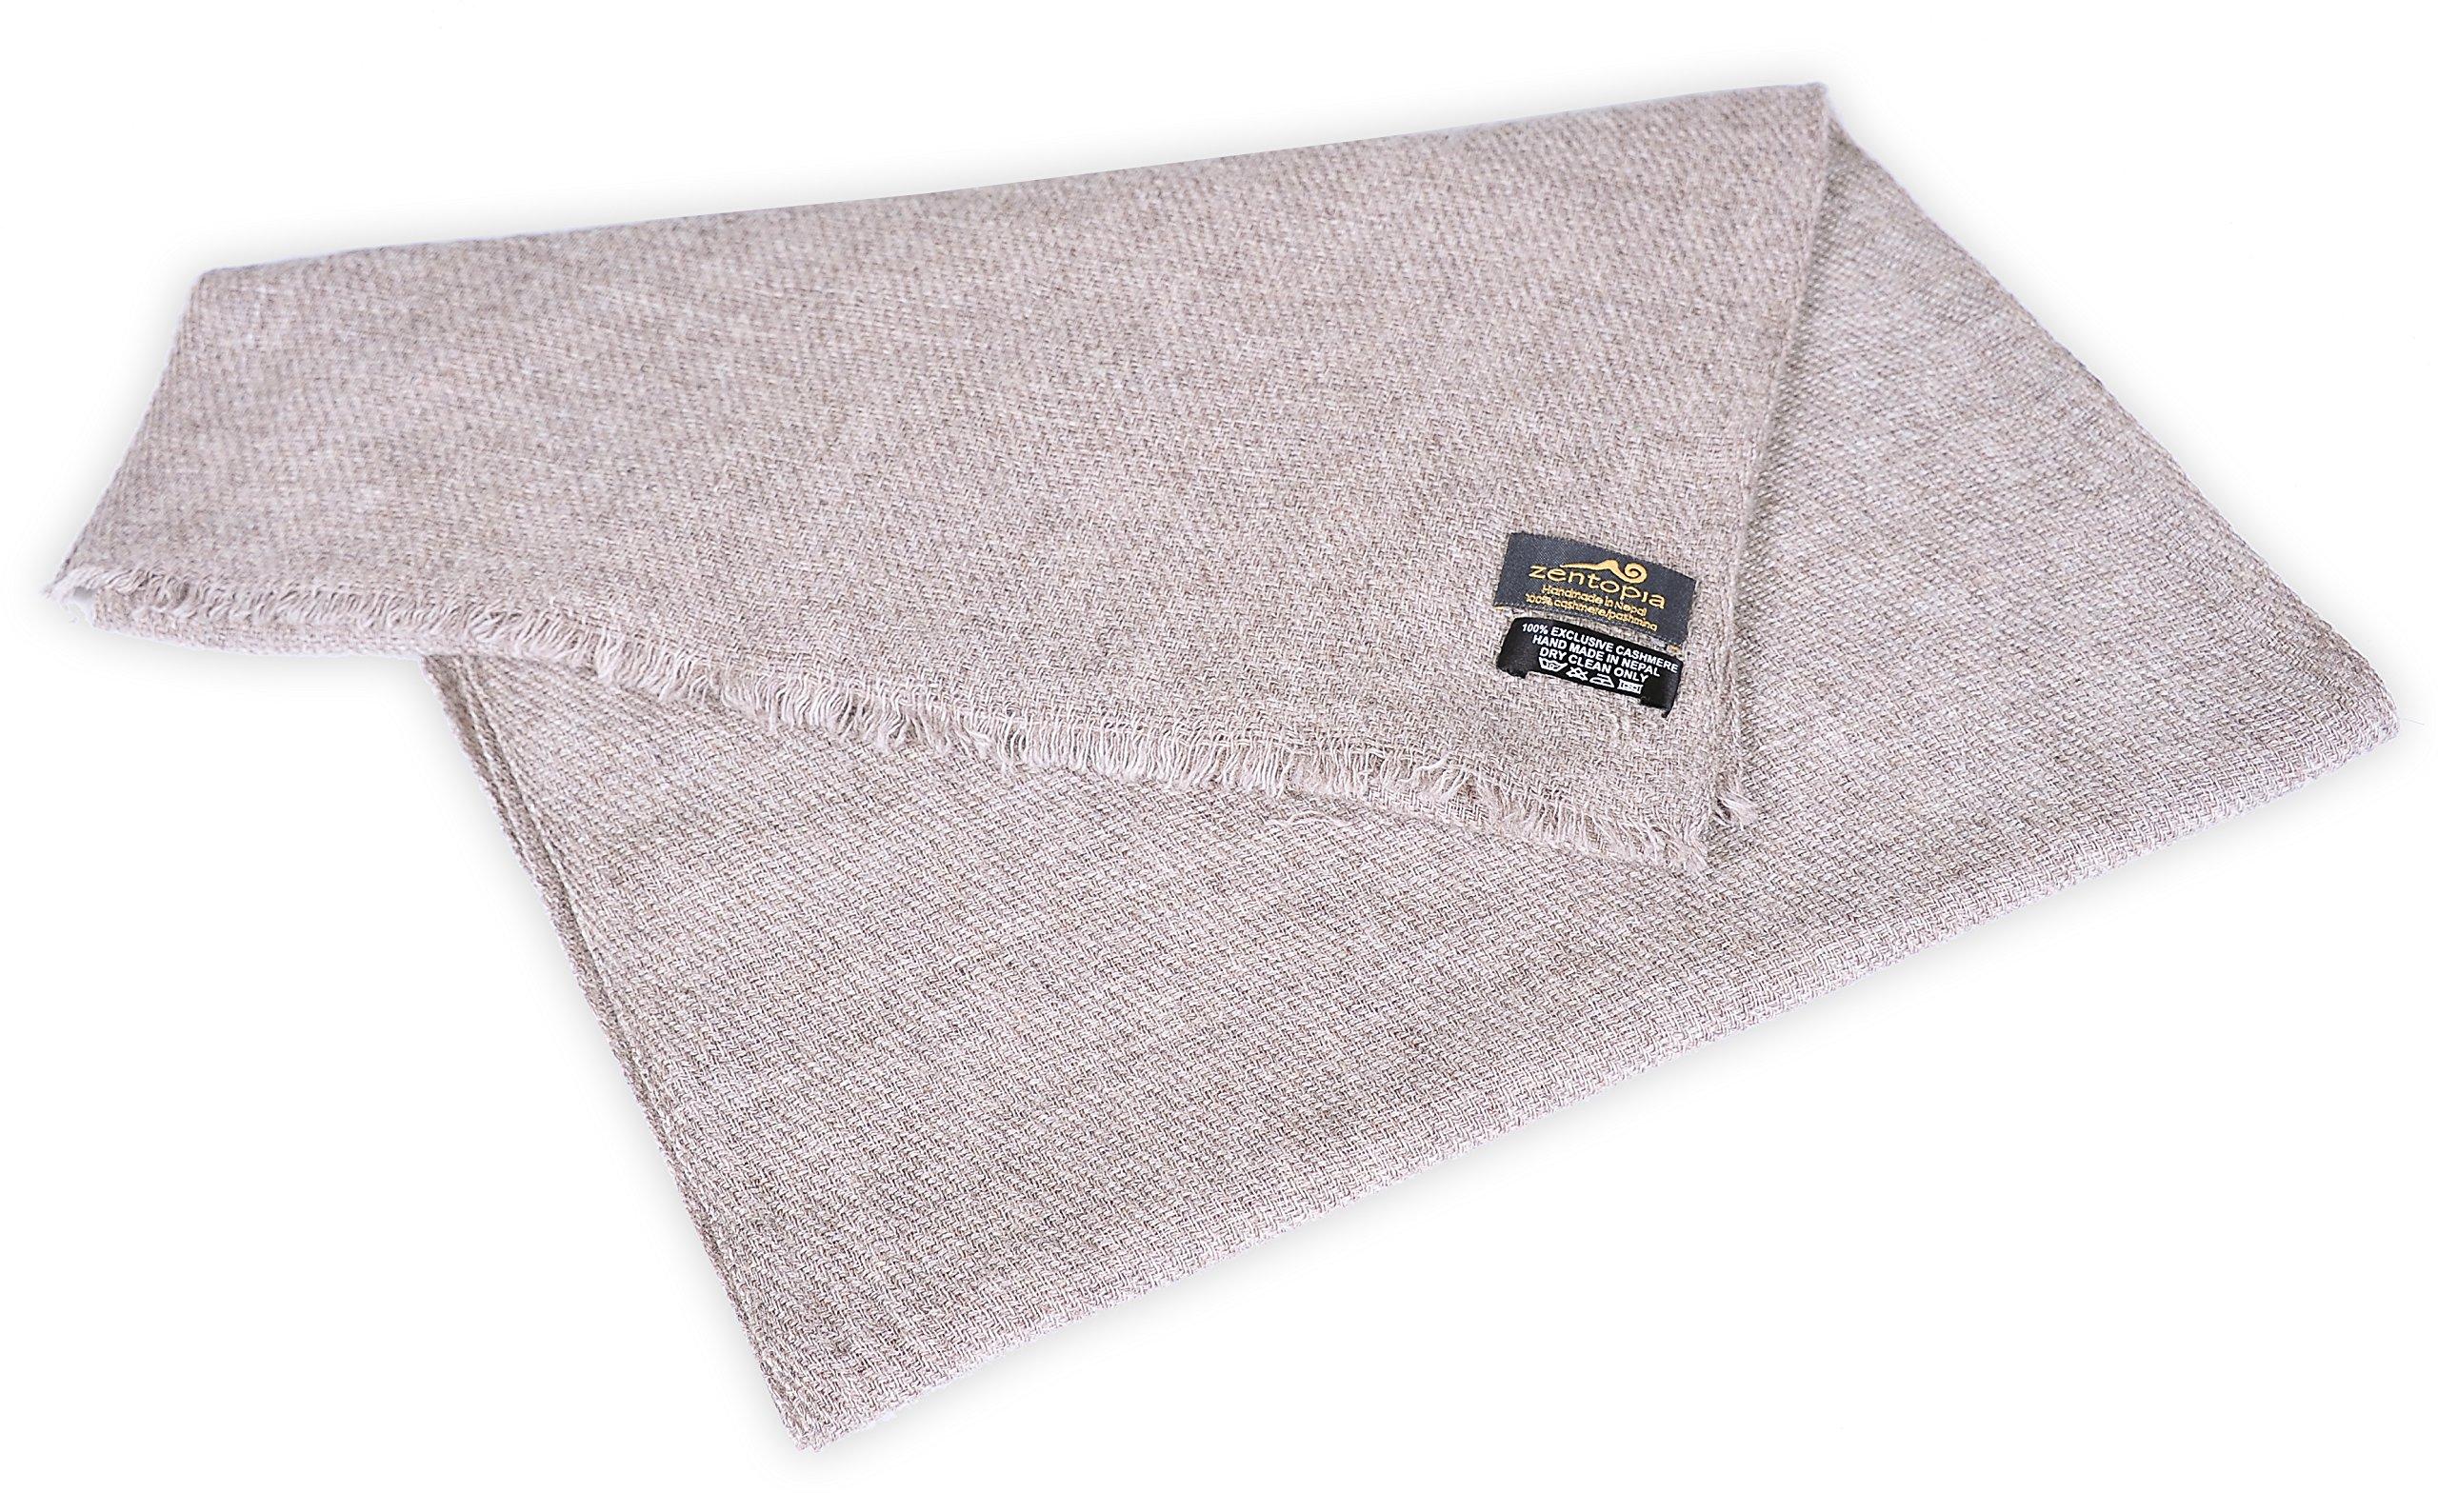 Zentopia classic 100% Grade A cashmere handmade scarf narrow cut light weight (Khaki) by Zentopia (Image #3)